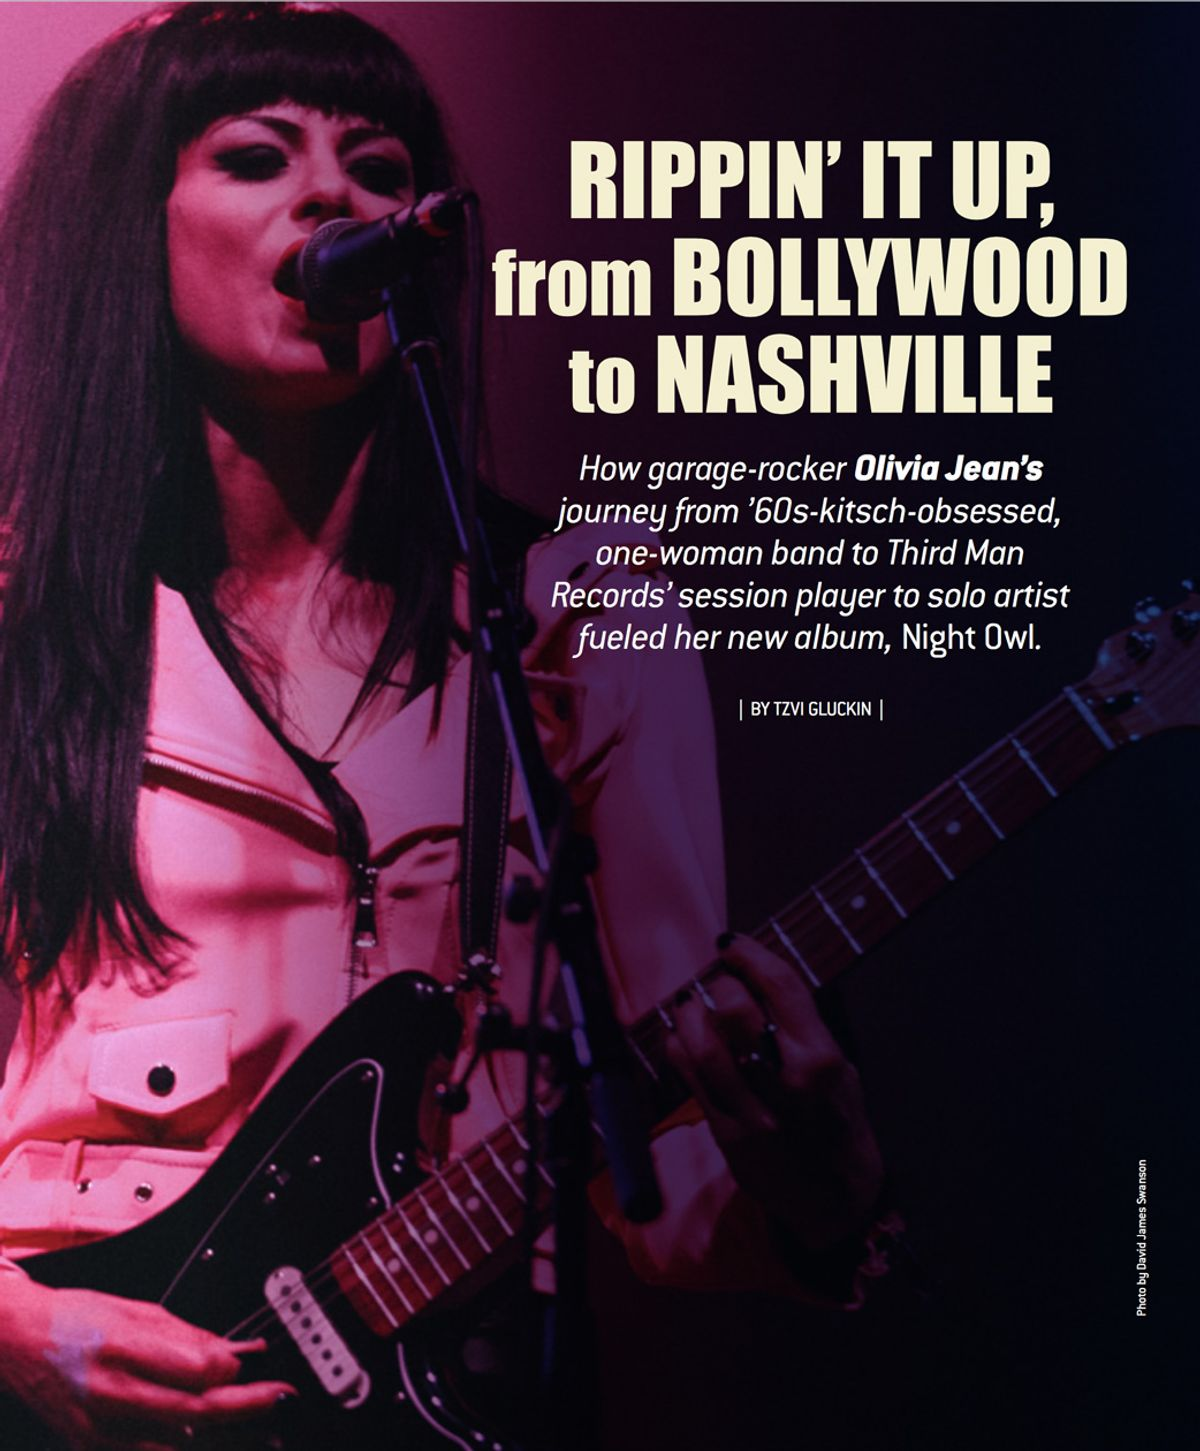 Olivia Jean's Trip, from Bollywood to Nashville